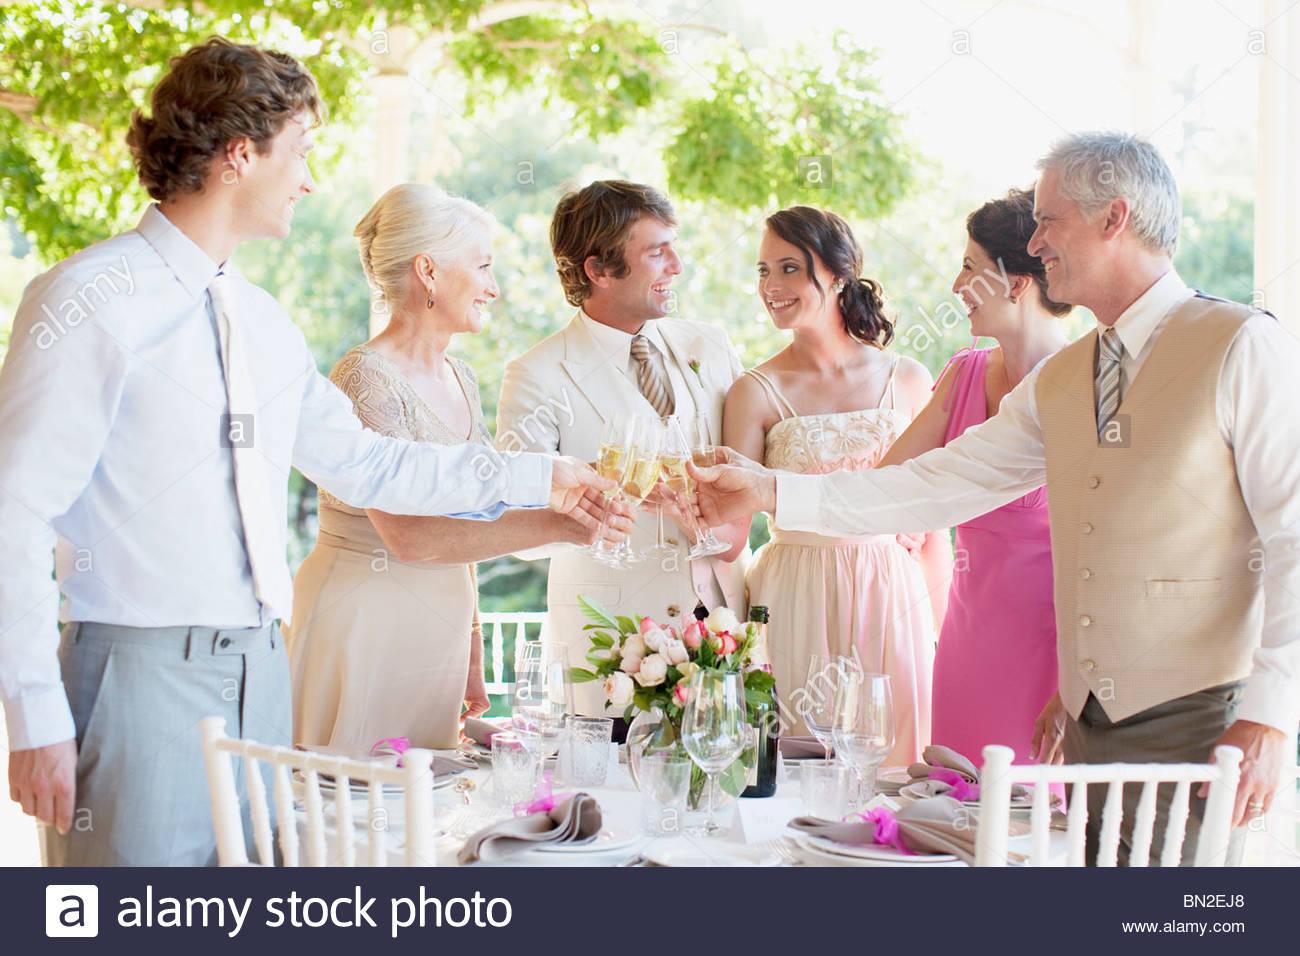 Family toasting at wedding reception - Stock Image